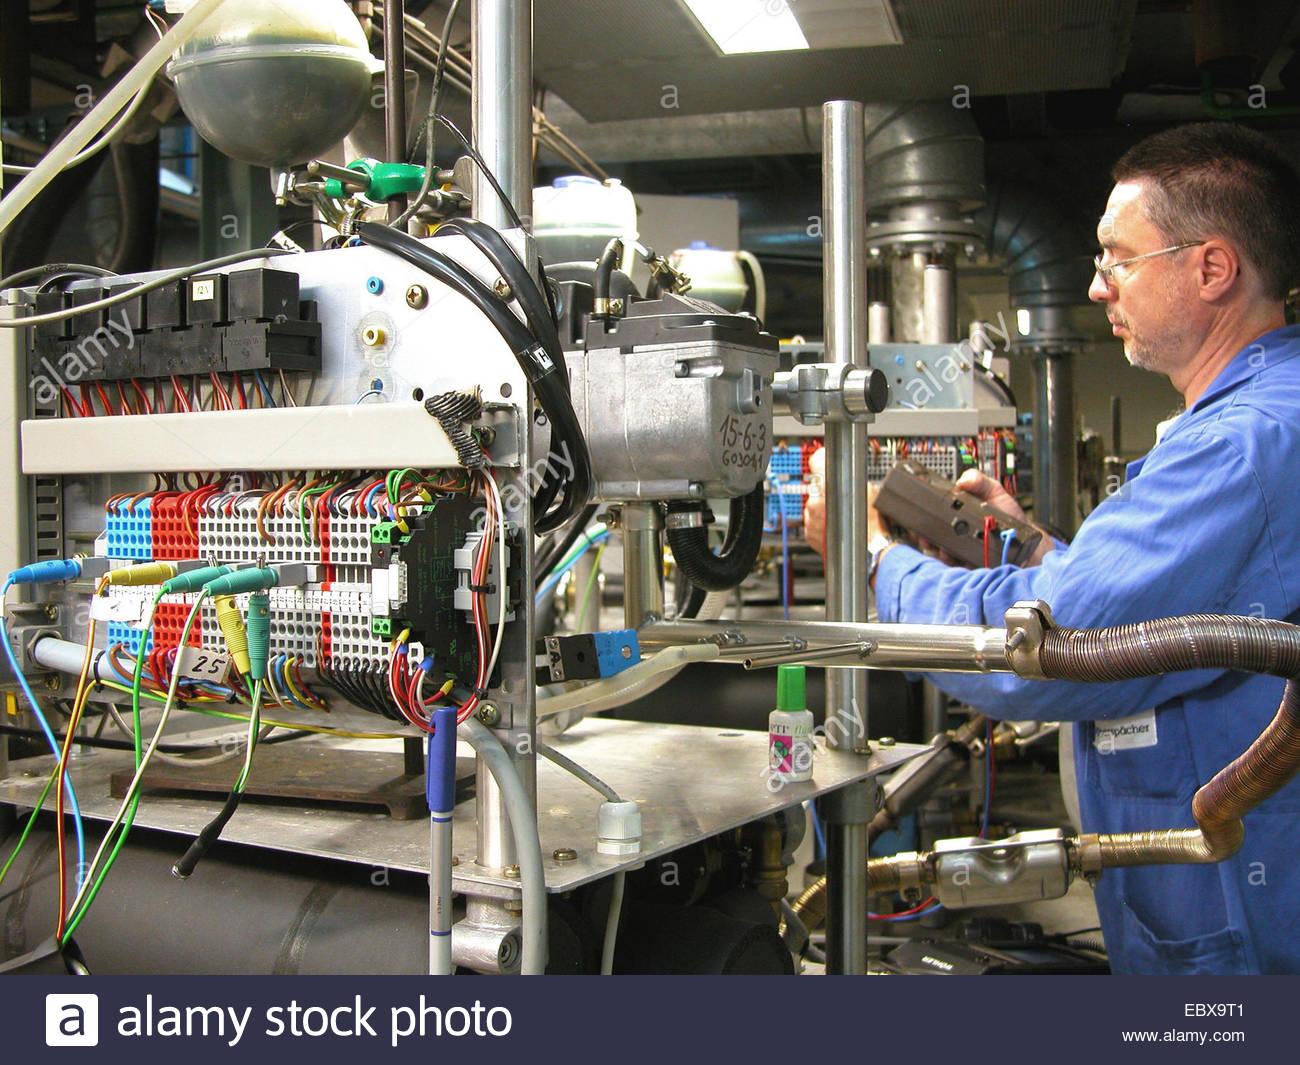 worker in industry - Stock Image